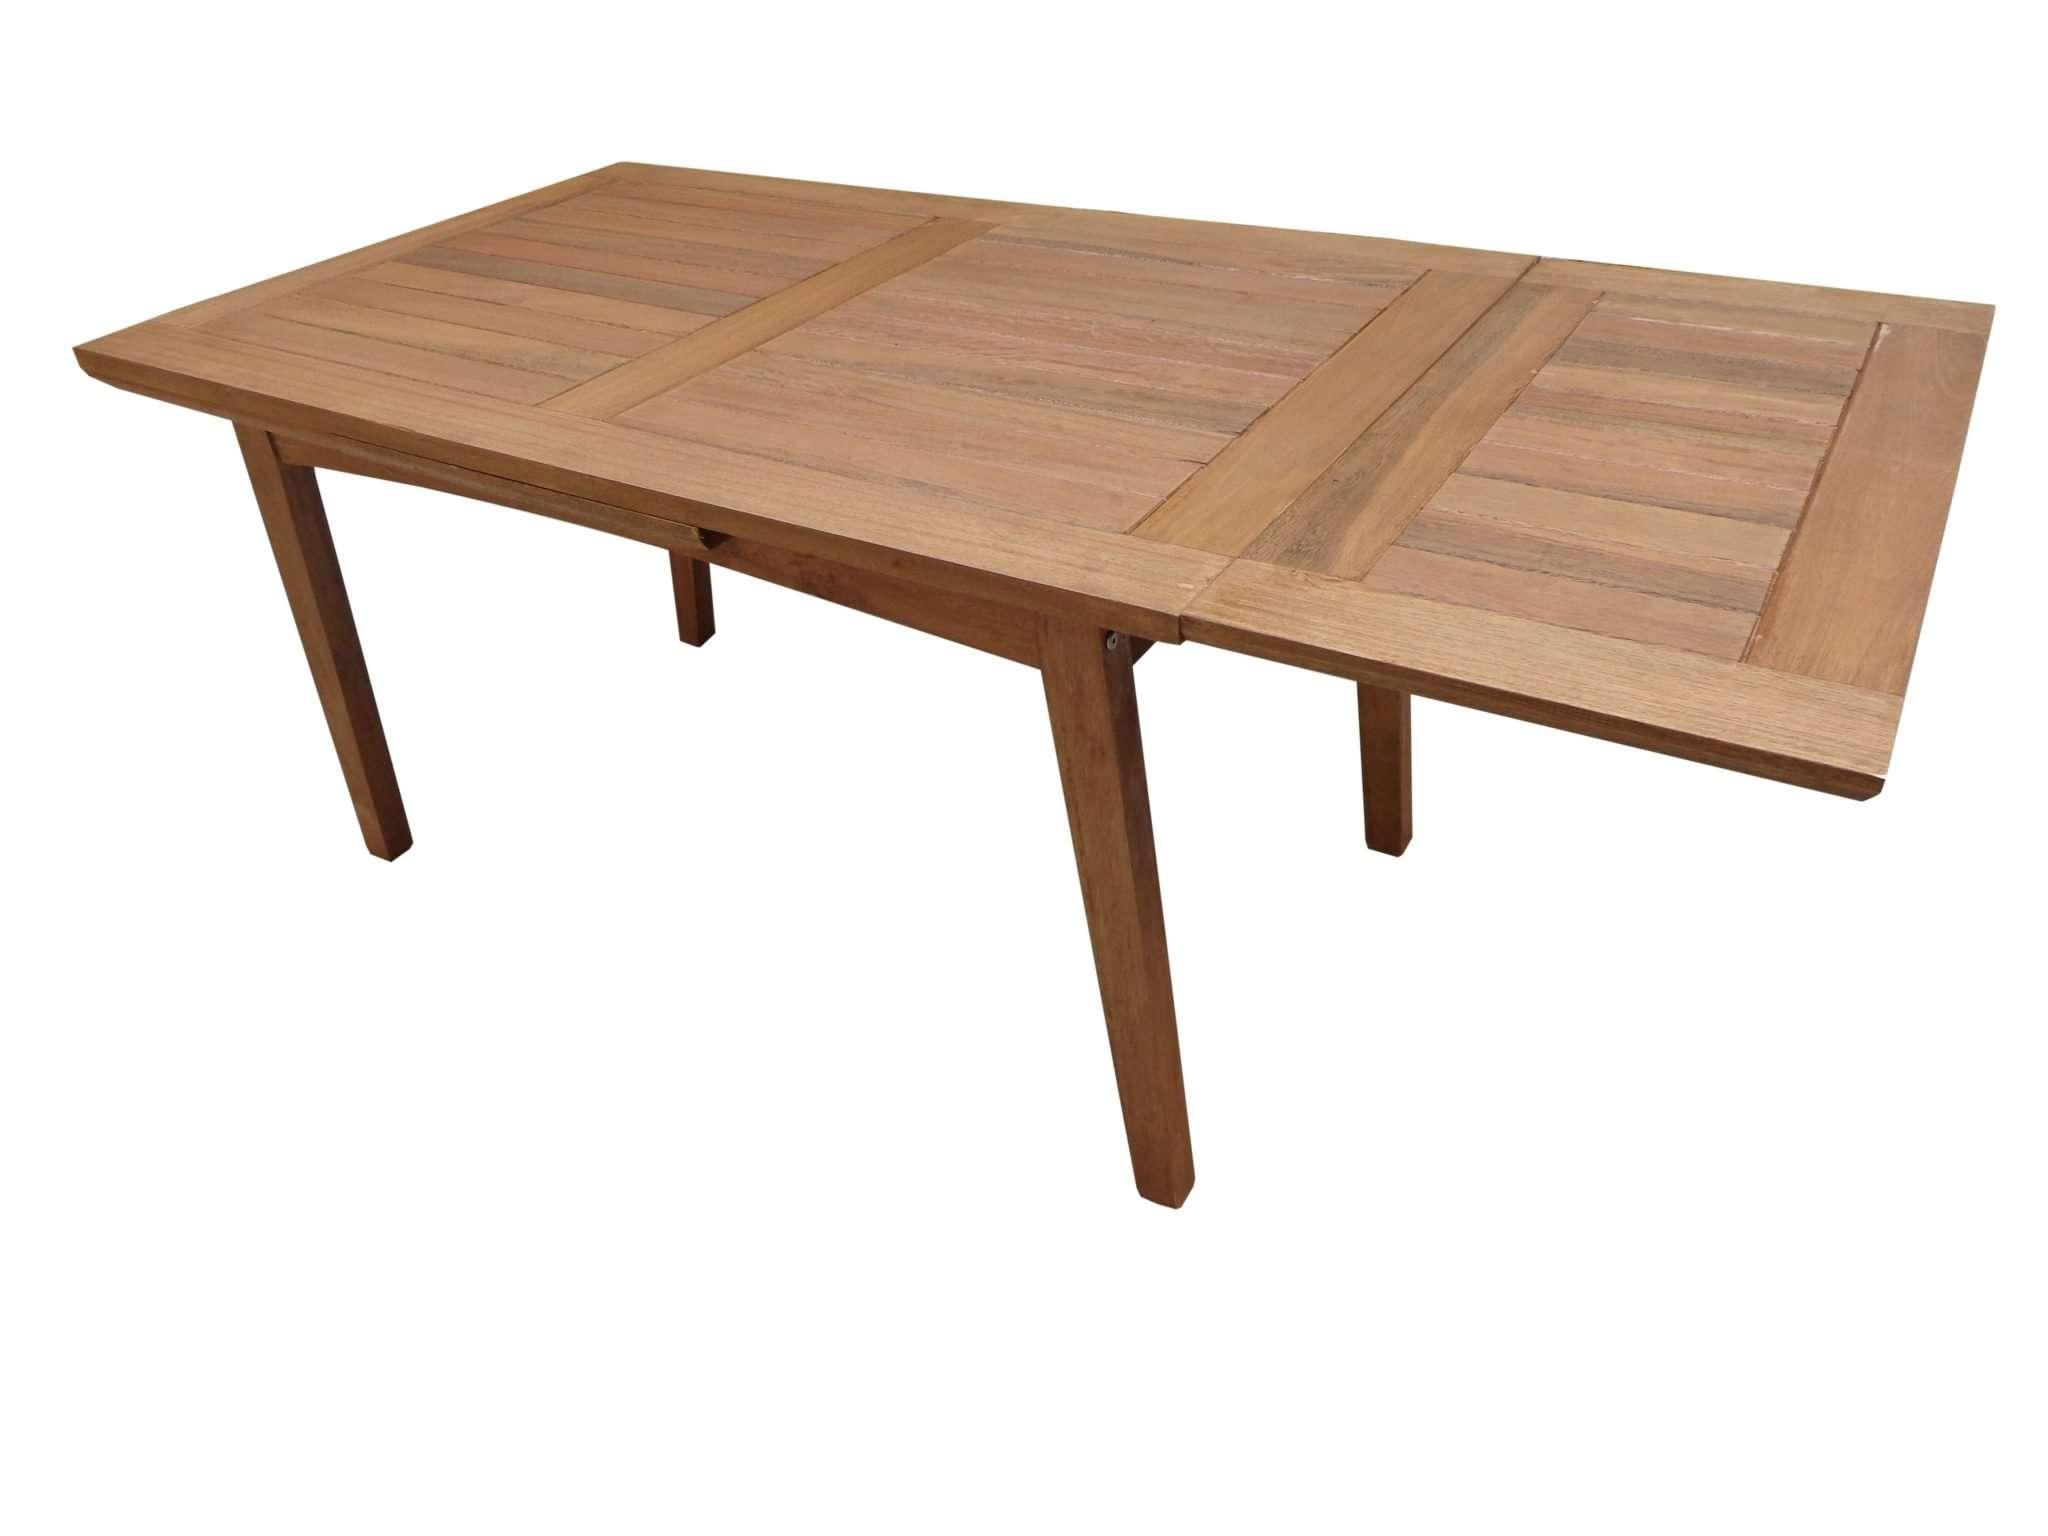 Mesa extensible fabrica de muebles forestry muebles - Comoda mesa extensible ...